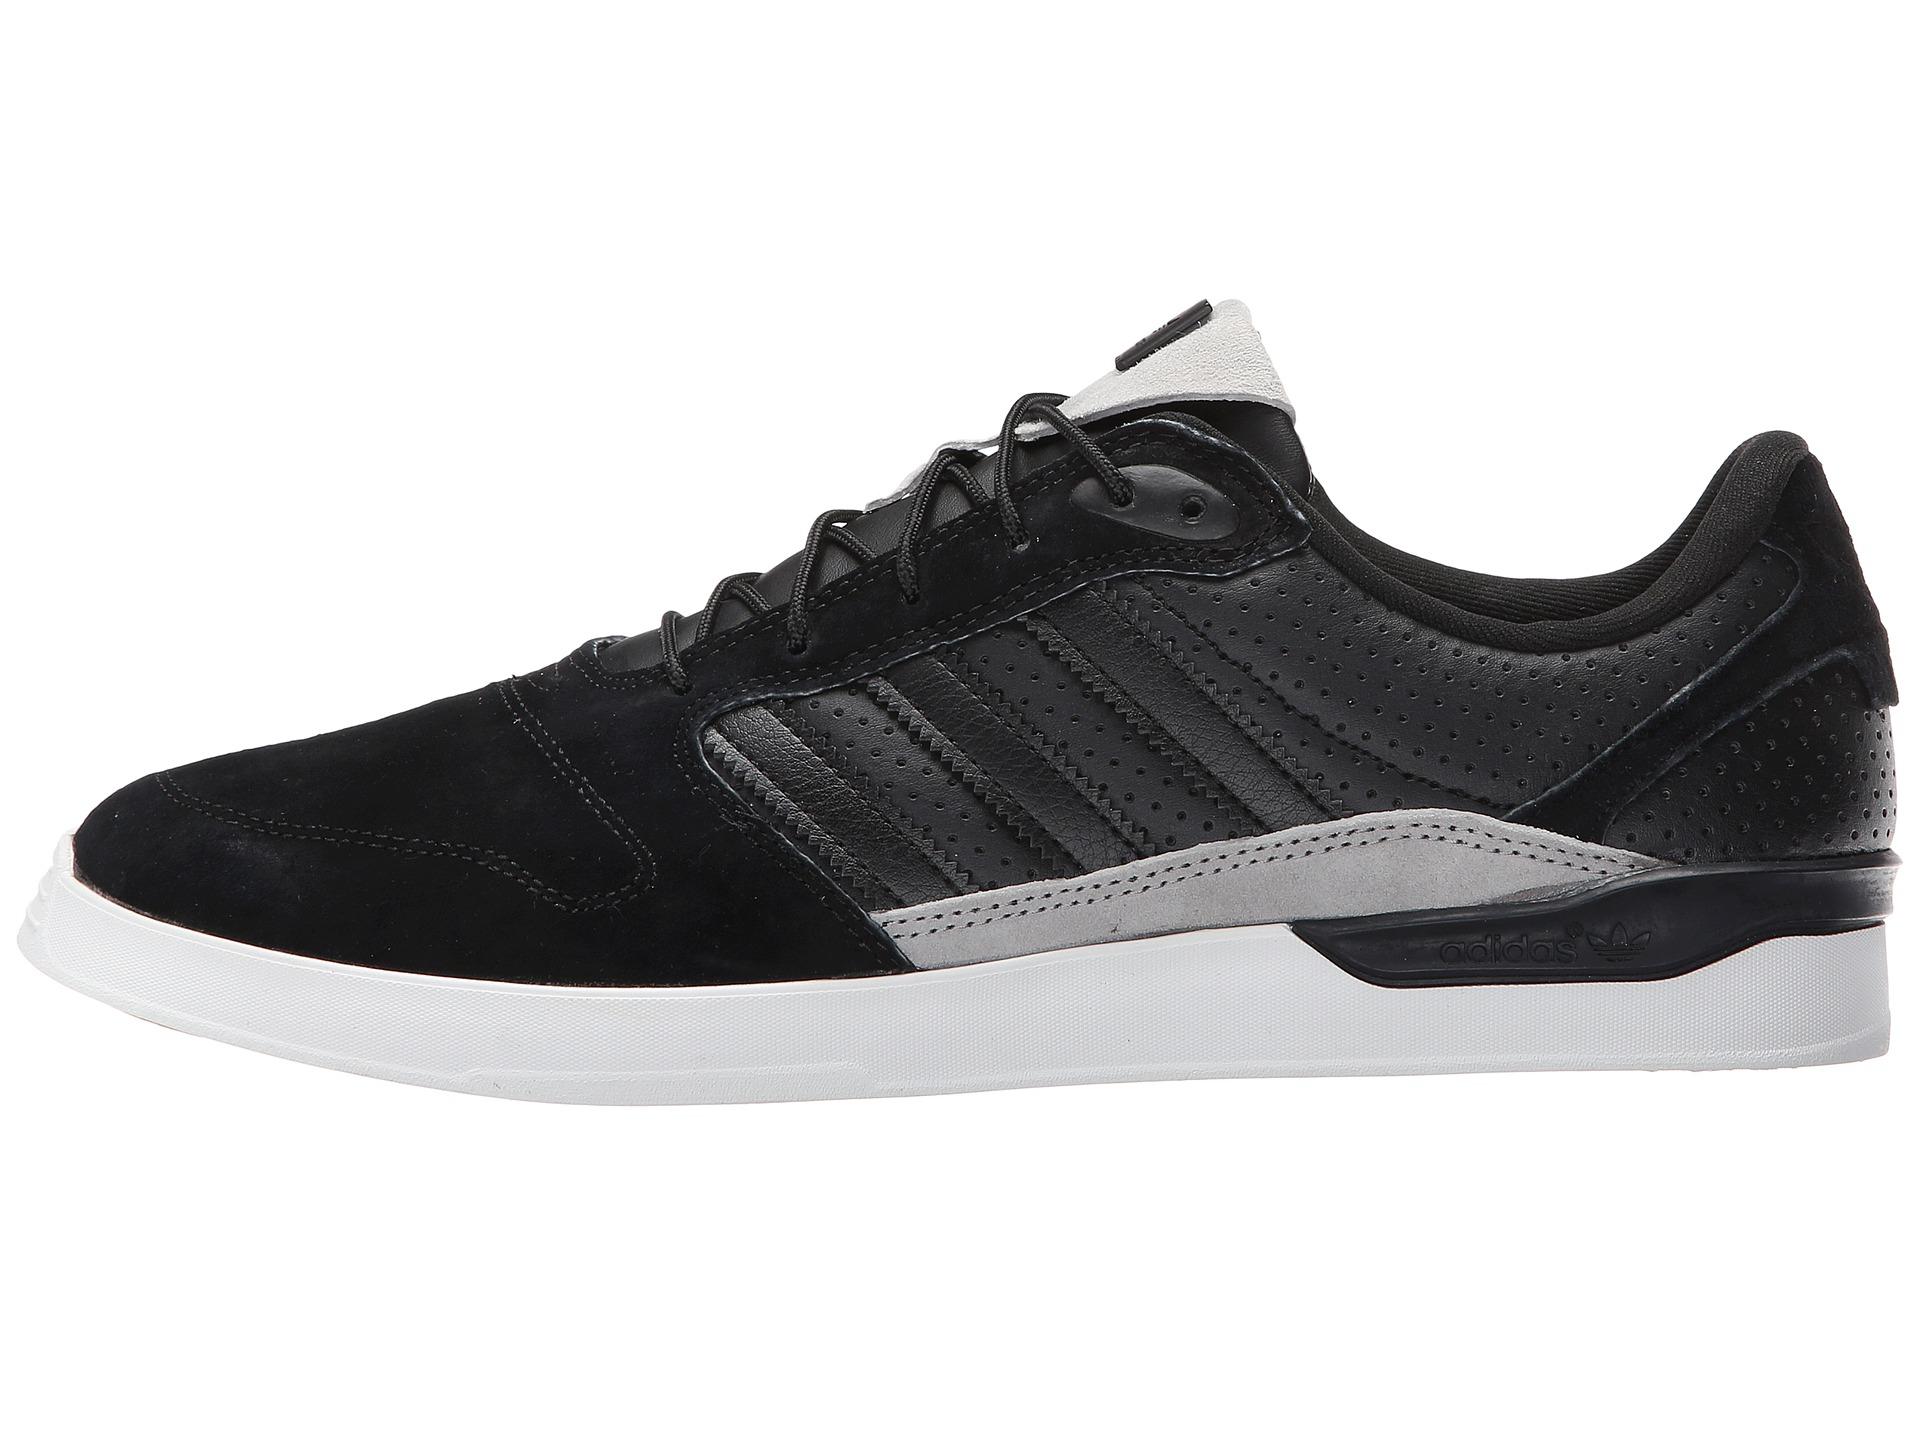 Lyst - Adidas Originals Zx Vulc Classified in Black for Men